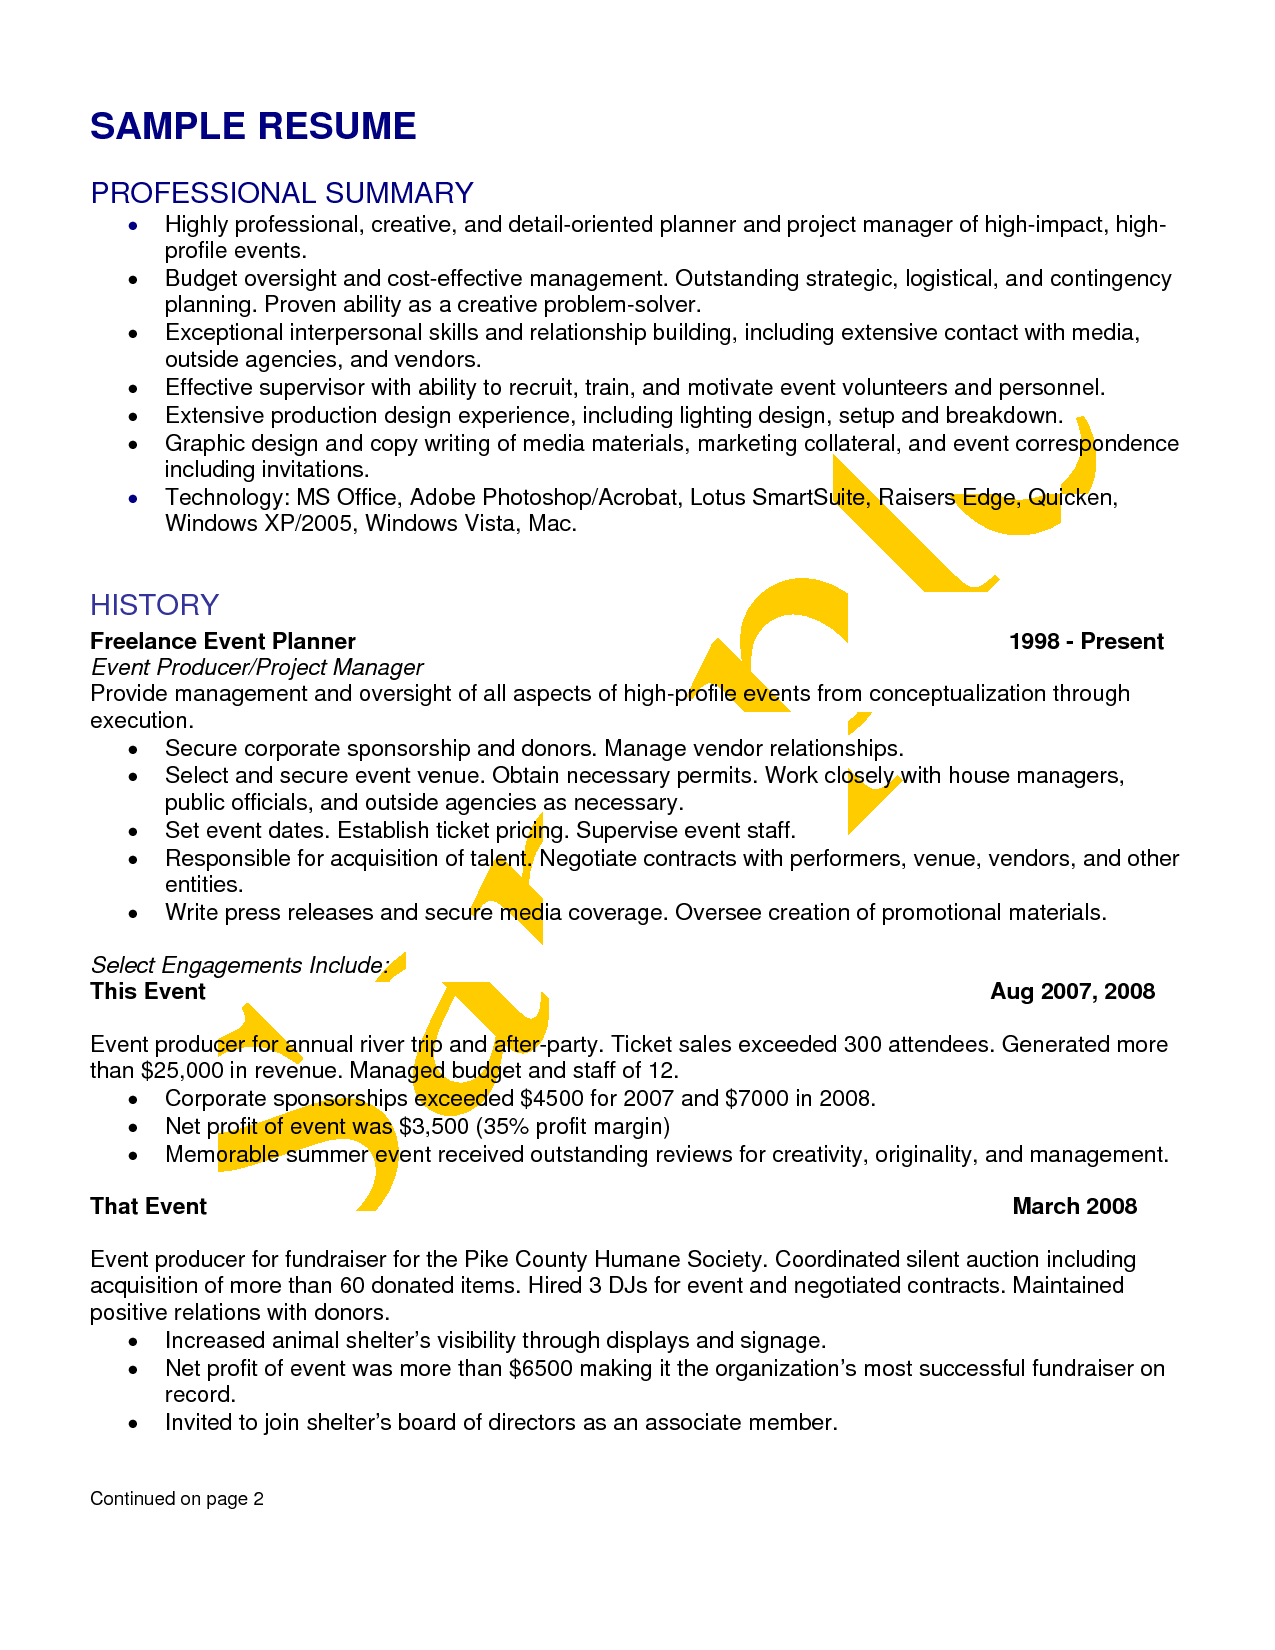 wedding  u0026 event planner resume sample      yesidomariage